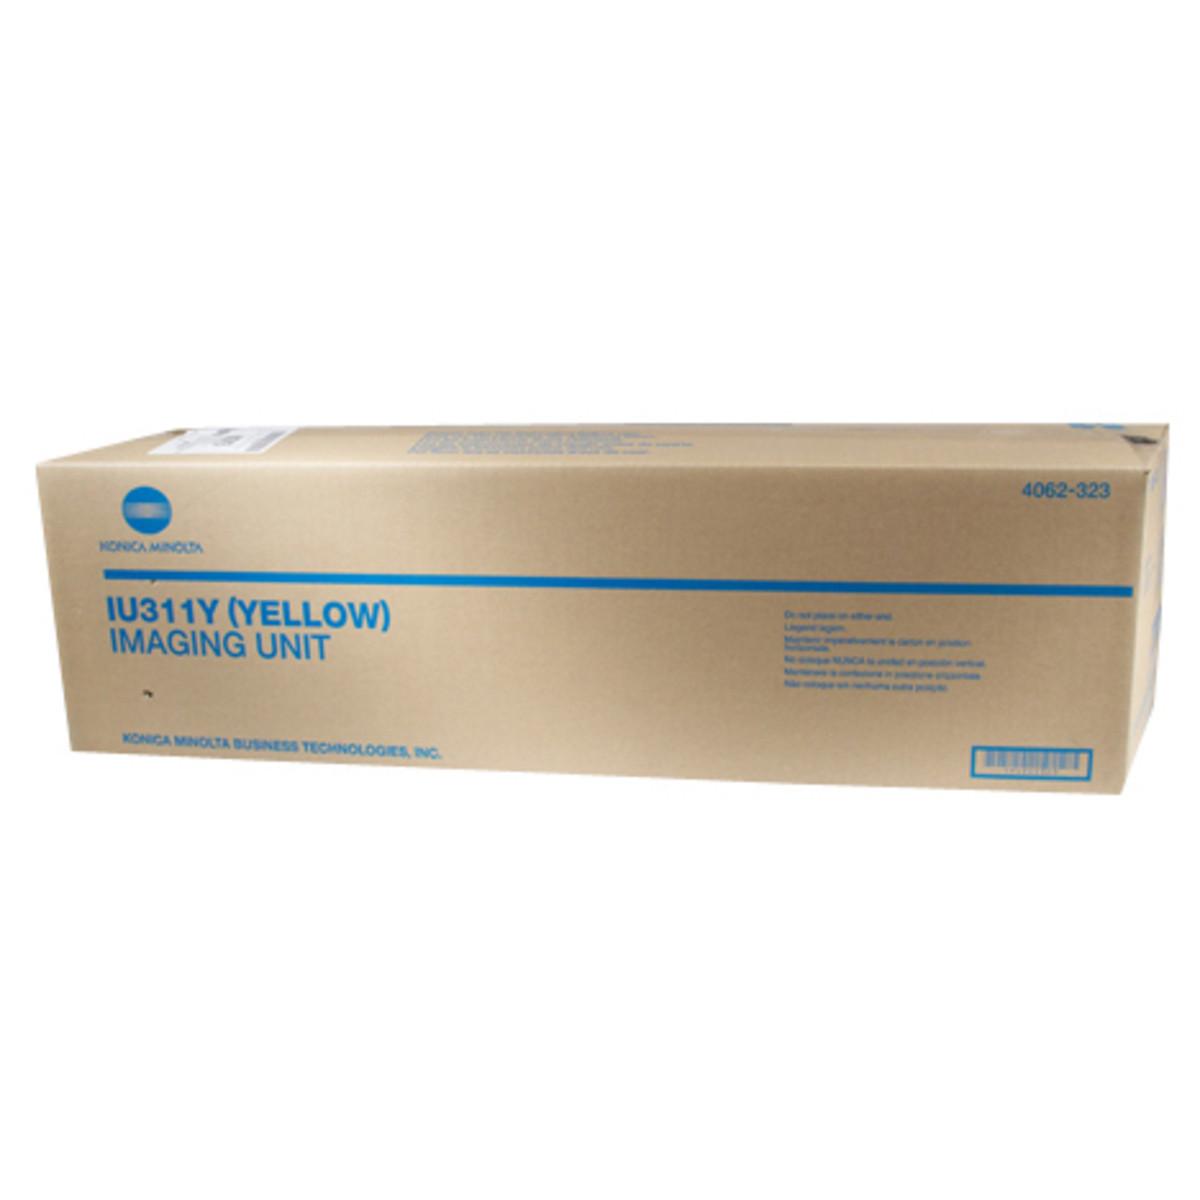 Konica Minolta 4062-323 Yellow Drum Unit